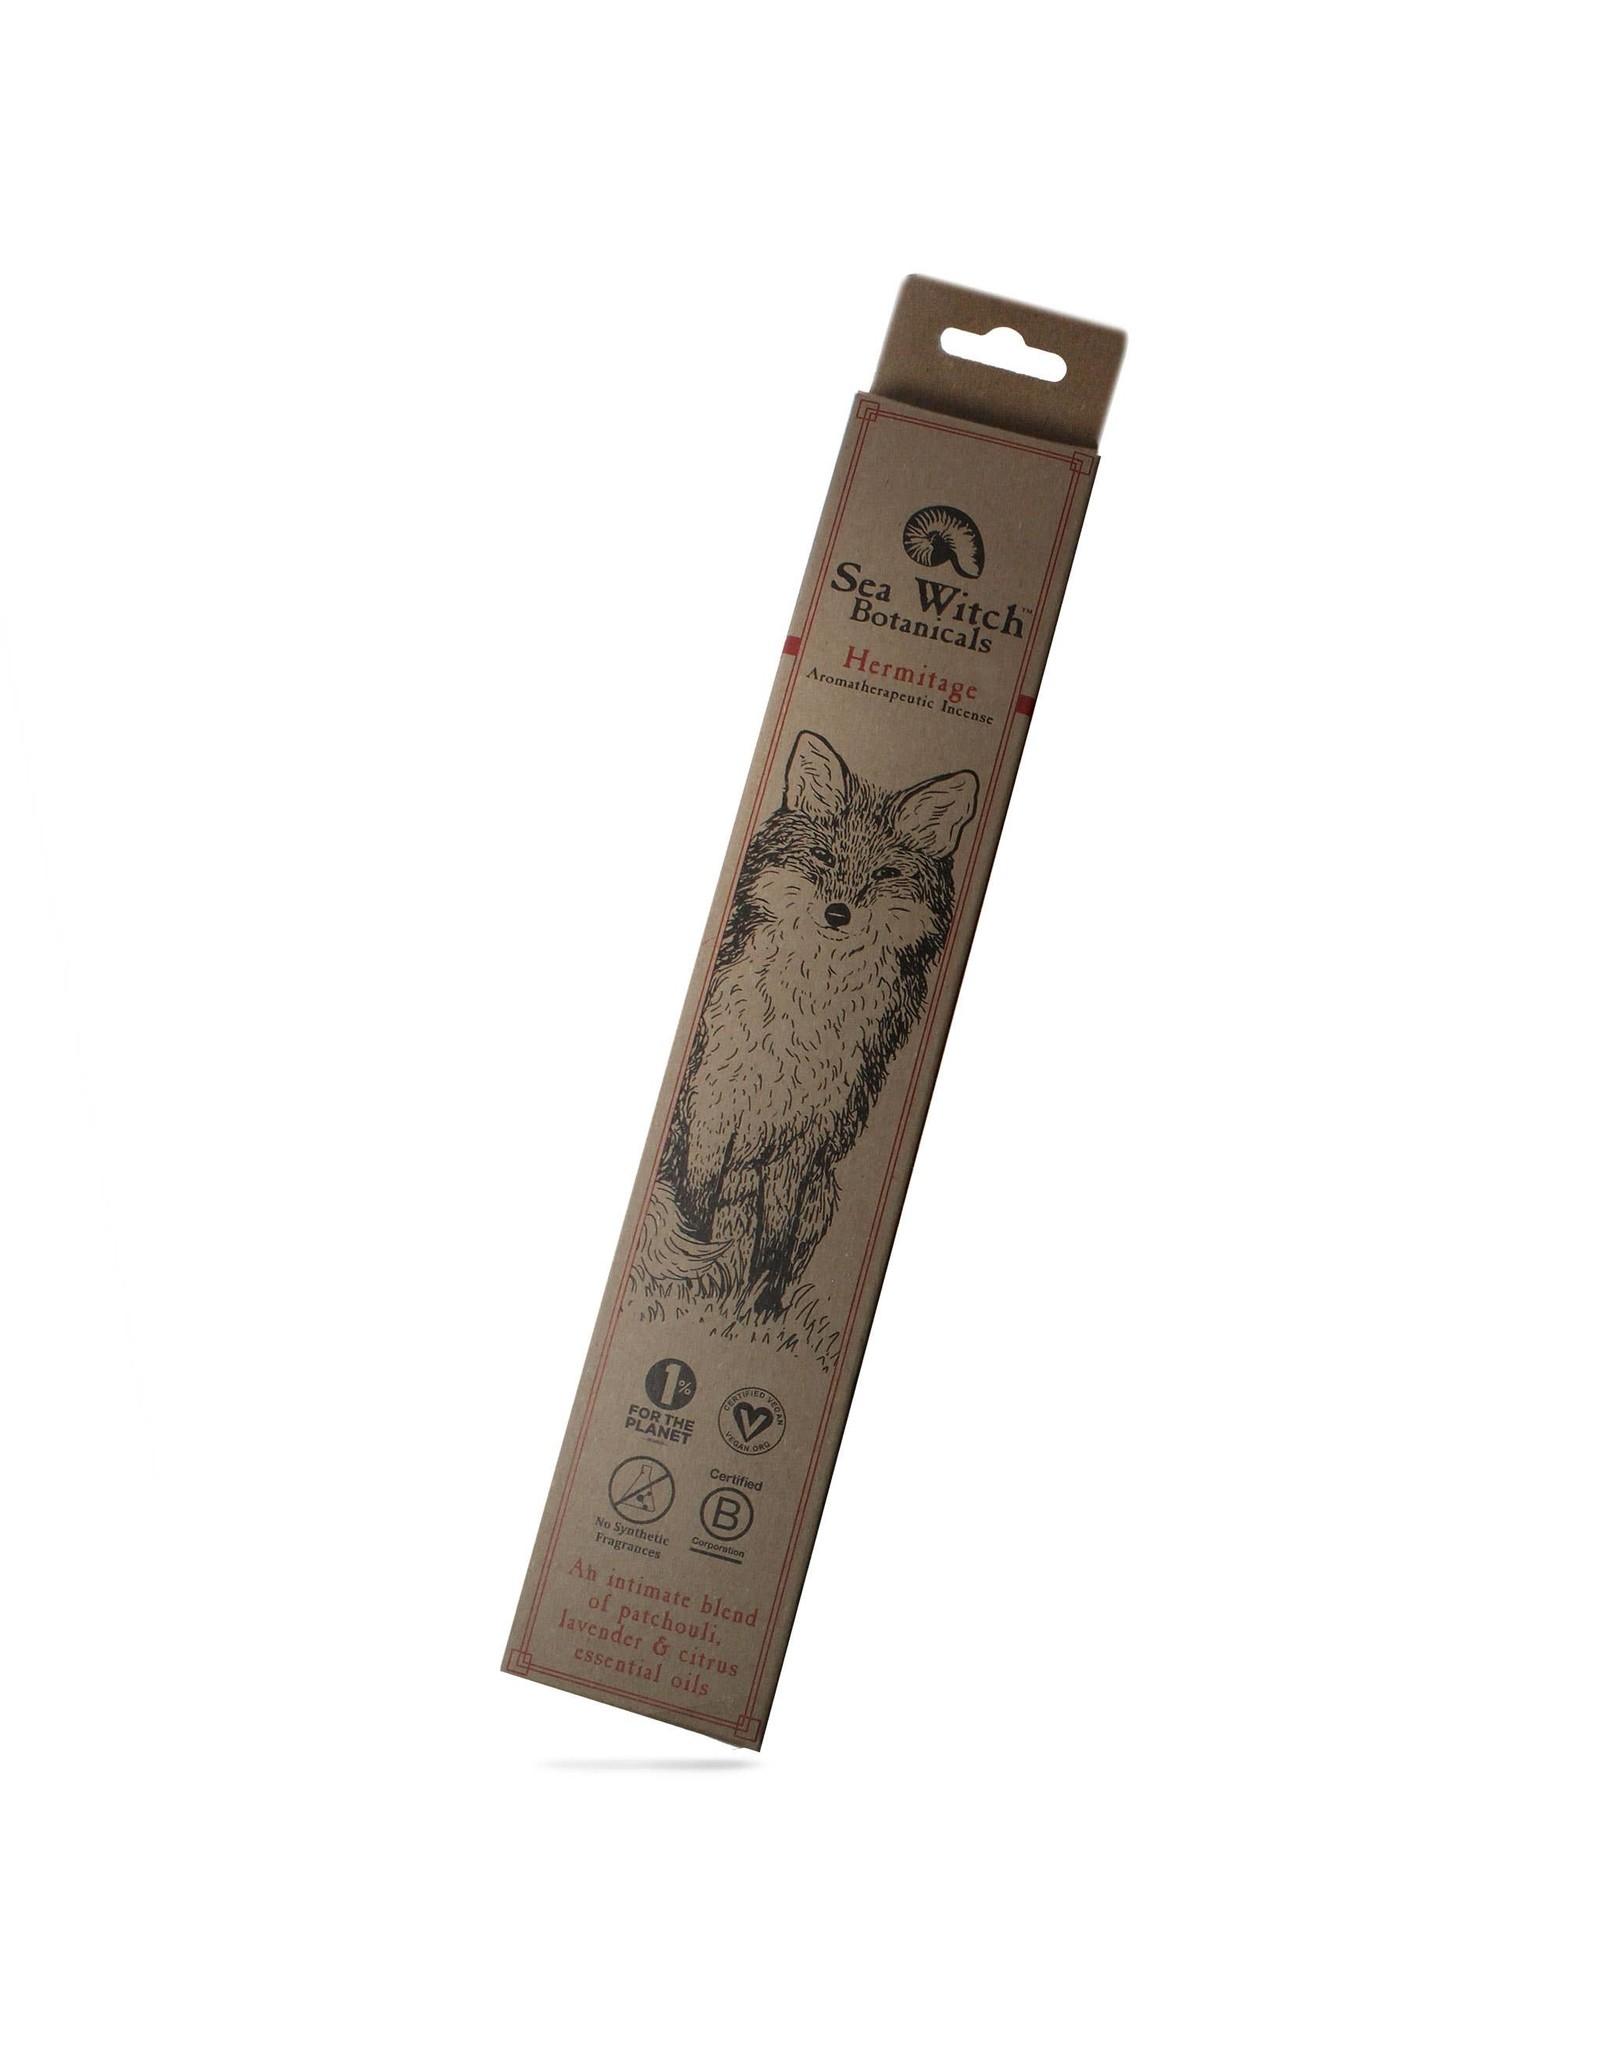 Incense Pack - Hermitage, 25ct